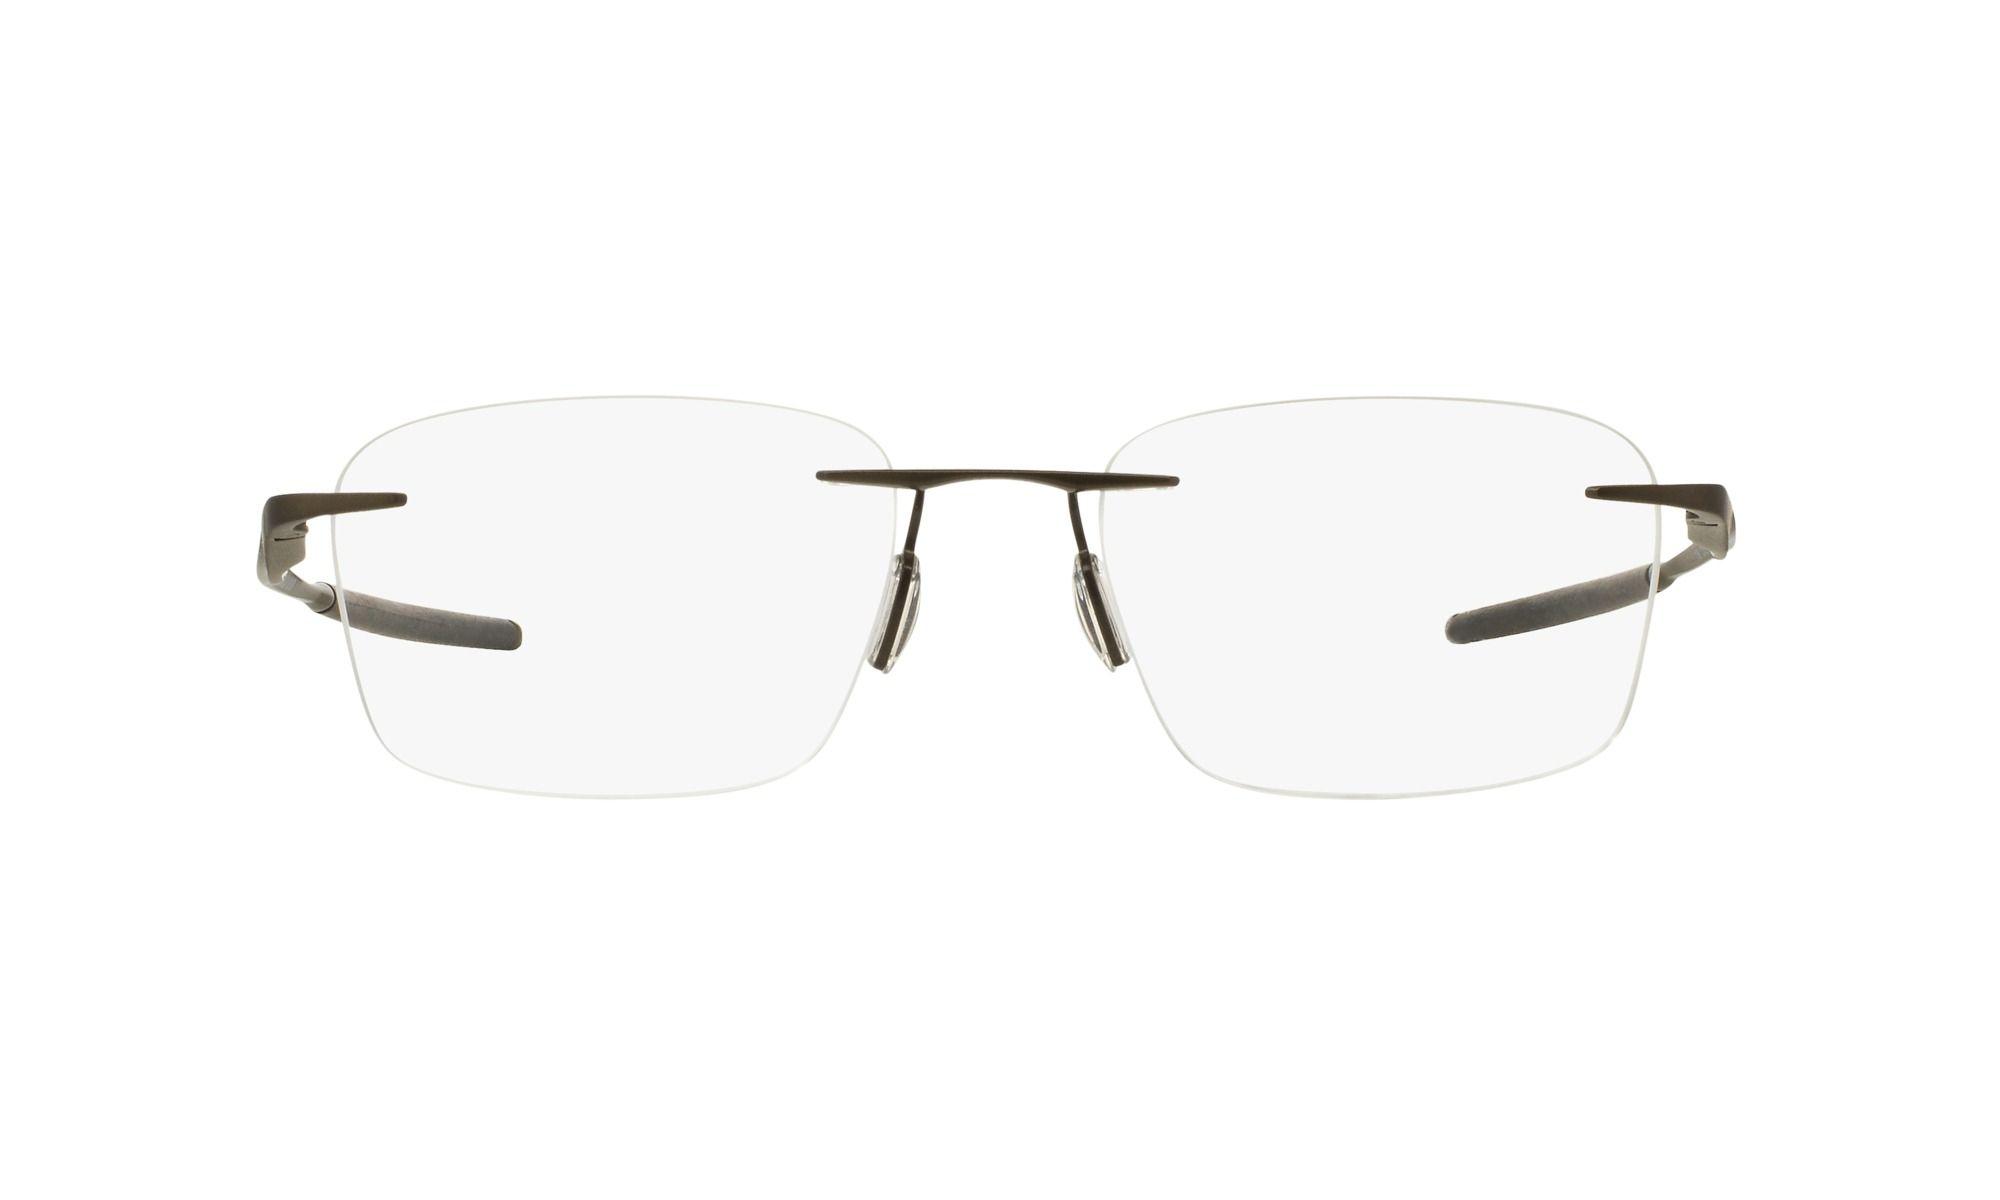 oculos de grau oakley wingfold evs ox5115 - Busca na Alex Milan 011 ... be036ce03f